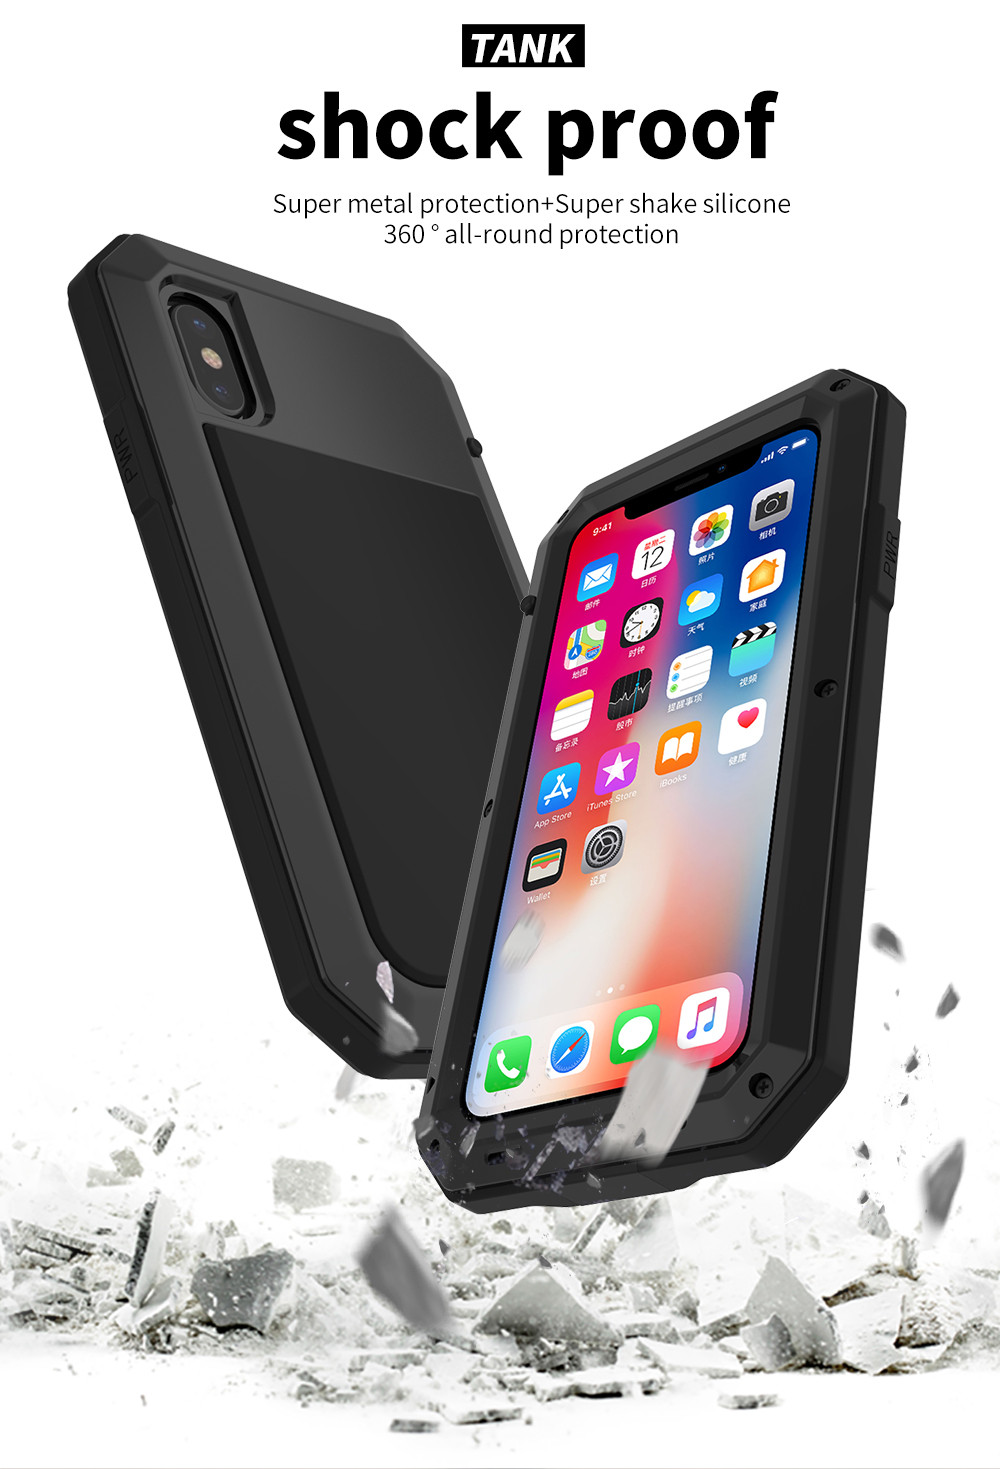 HTB1Ea1FeH5YBuNjSspoq6zeNFXaJ Heavy Duty Protection Doom armor Metal Aluminum phone Case for iPhone 11 Pro Max XR XS MAX 6 6S 7 8 Plus X 5S 5 Shockproof Cover